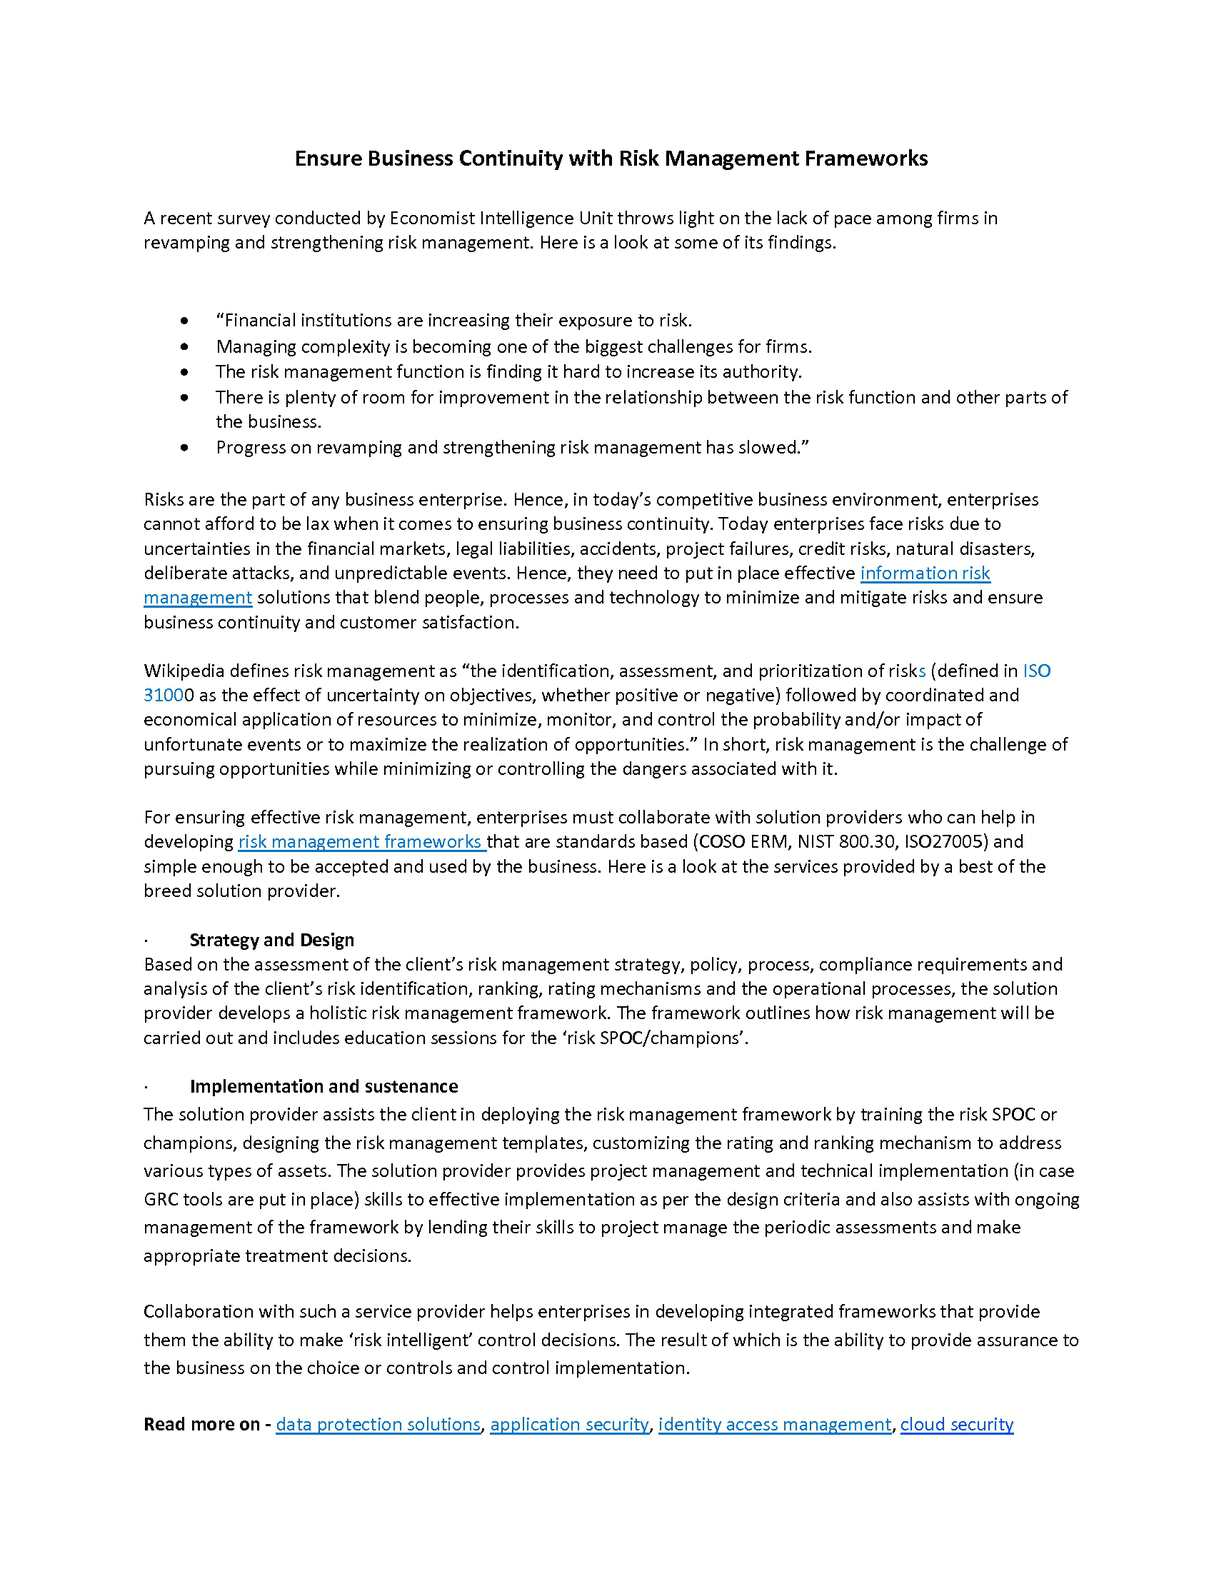 Calaméo - Ensure Business Continuity with Risk Management Frameworks